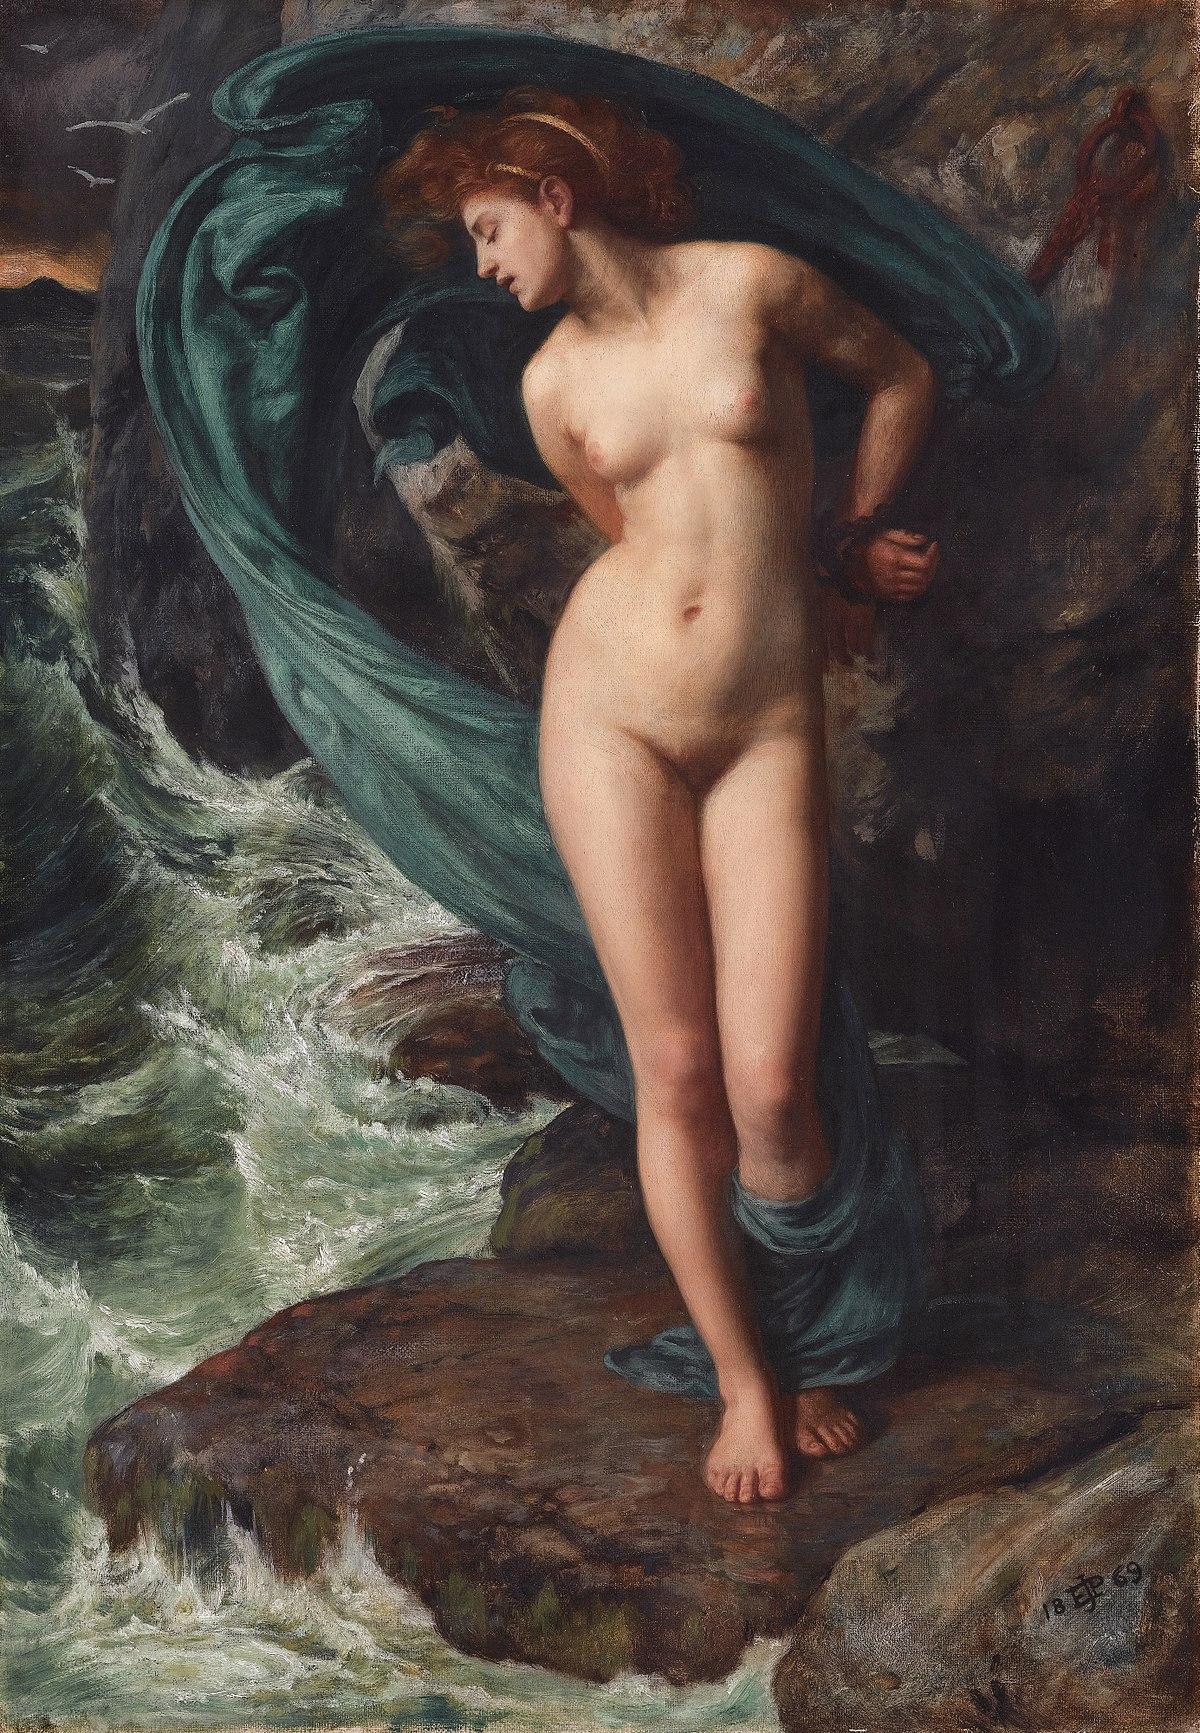 http://upload.wikimedia.org/wikipedia/commons/thumb/8/80/1869_Edward_Poynter_-_Andromeda.jpg/1200px-1869_Edward_Poynter_-_Andromeda.jpg